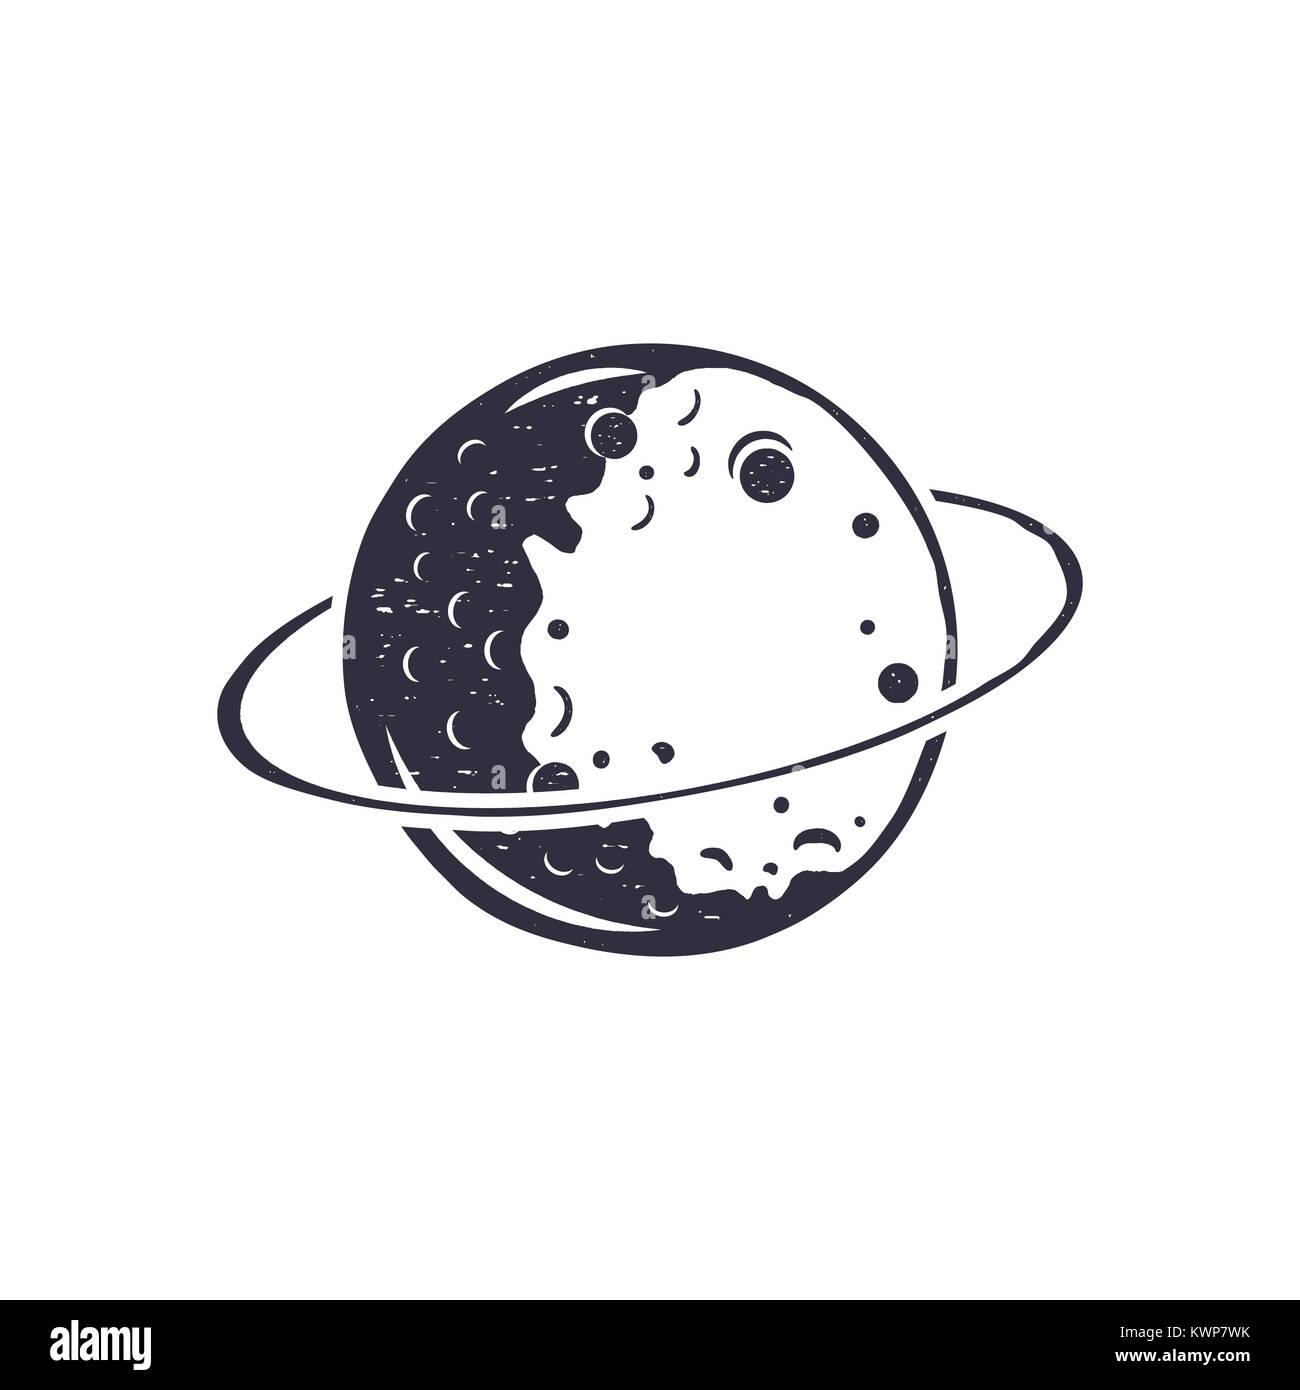 Vintage hand drawn moon symbol  Silhouette monochrome moon